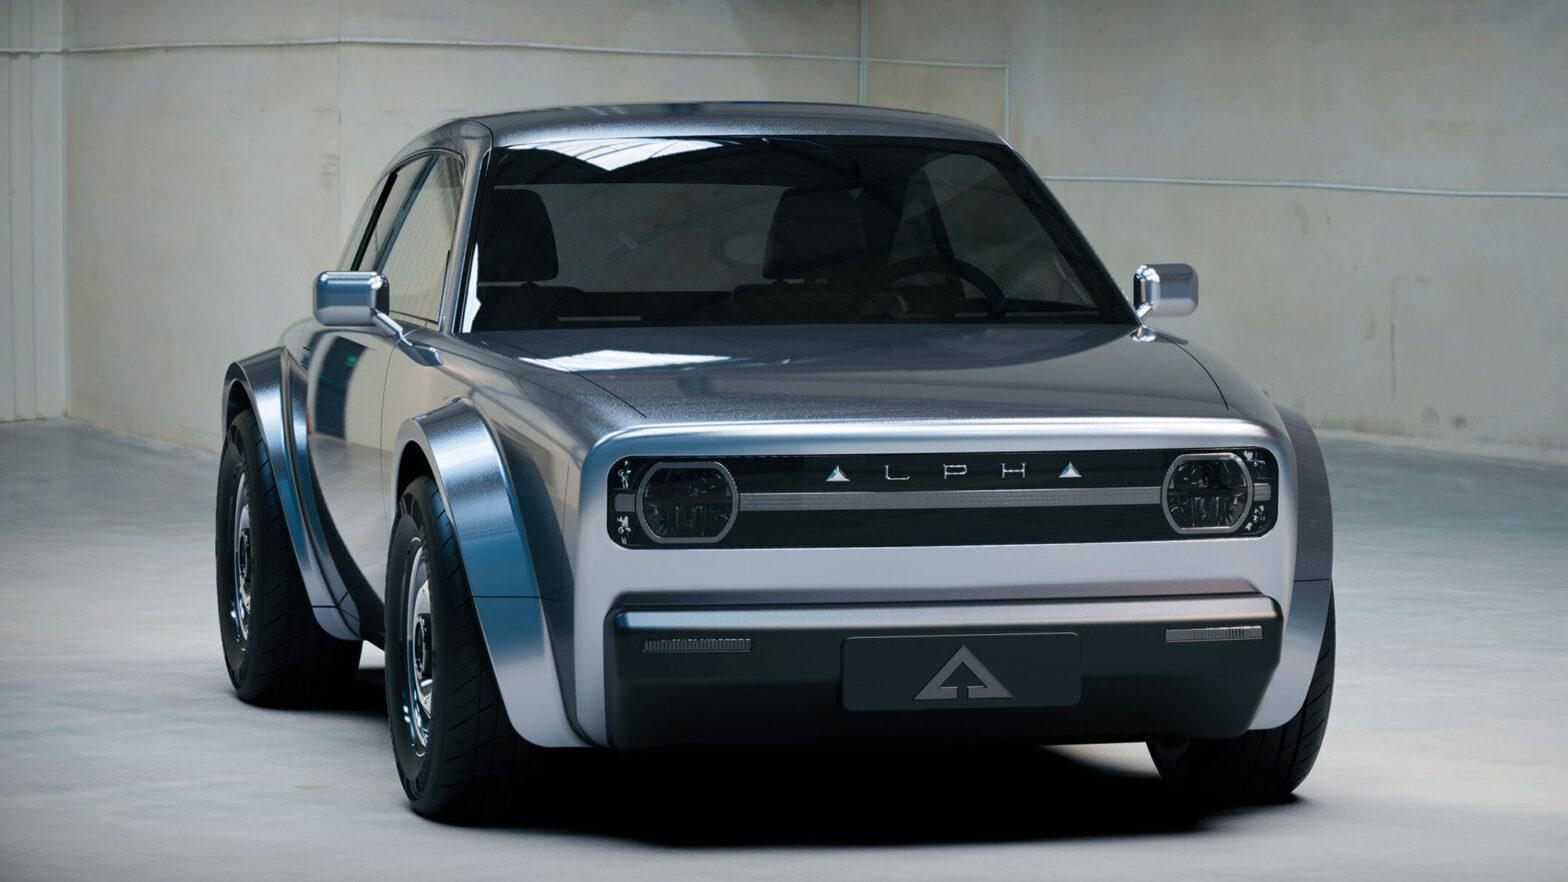 Alpha Ace Electric Vehicle